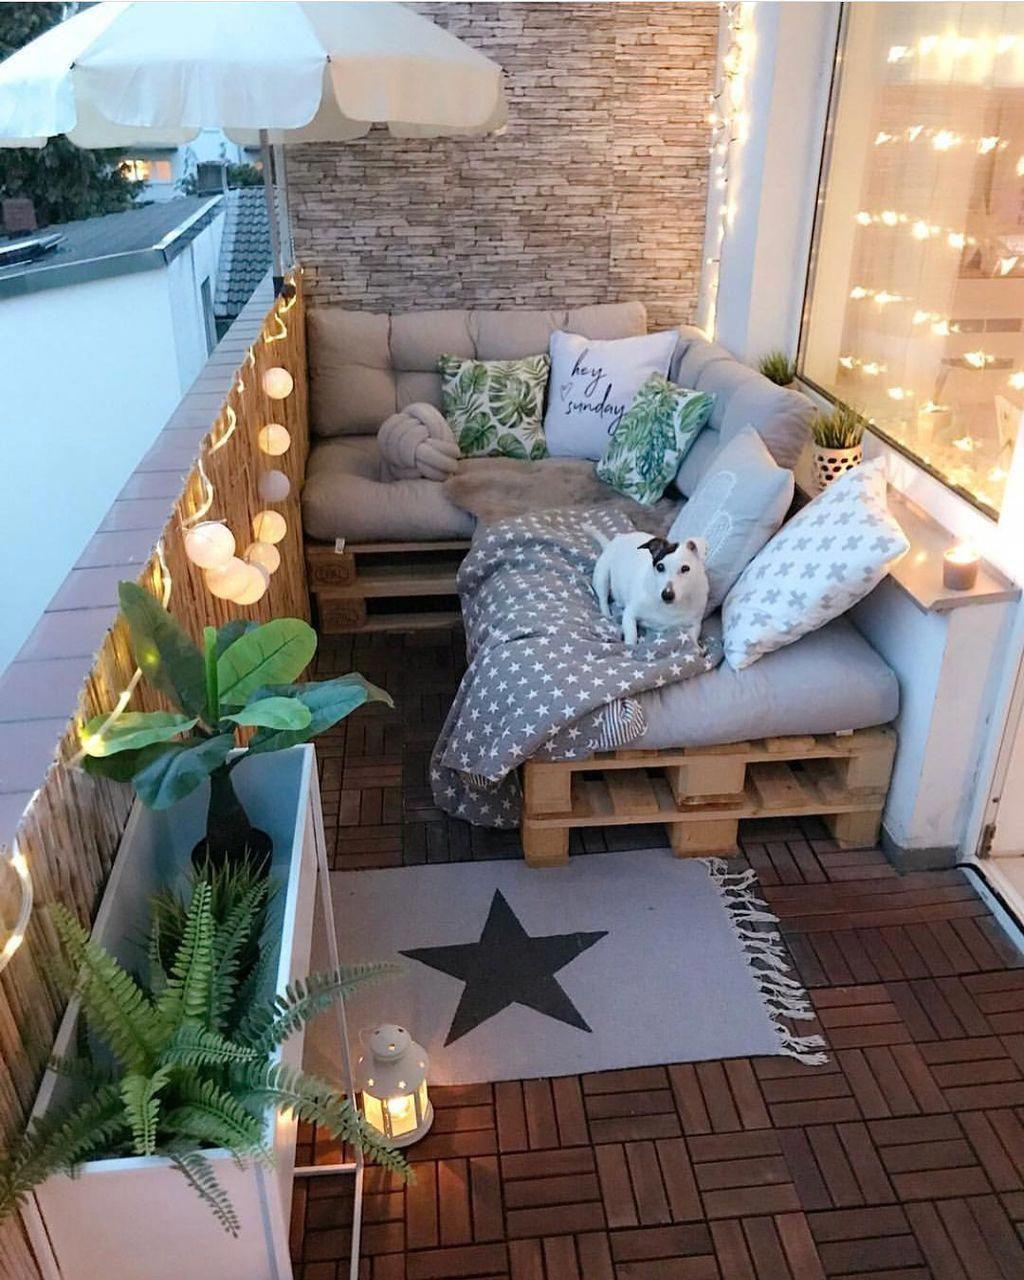 Gardening Umbrella Gardeningvolunteer Home Decor In 2019